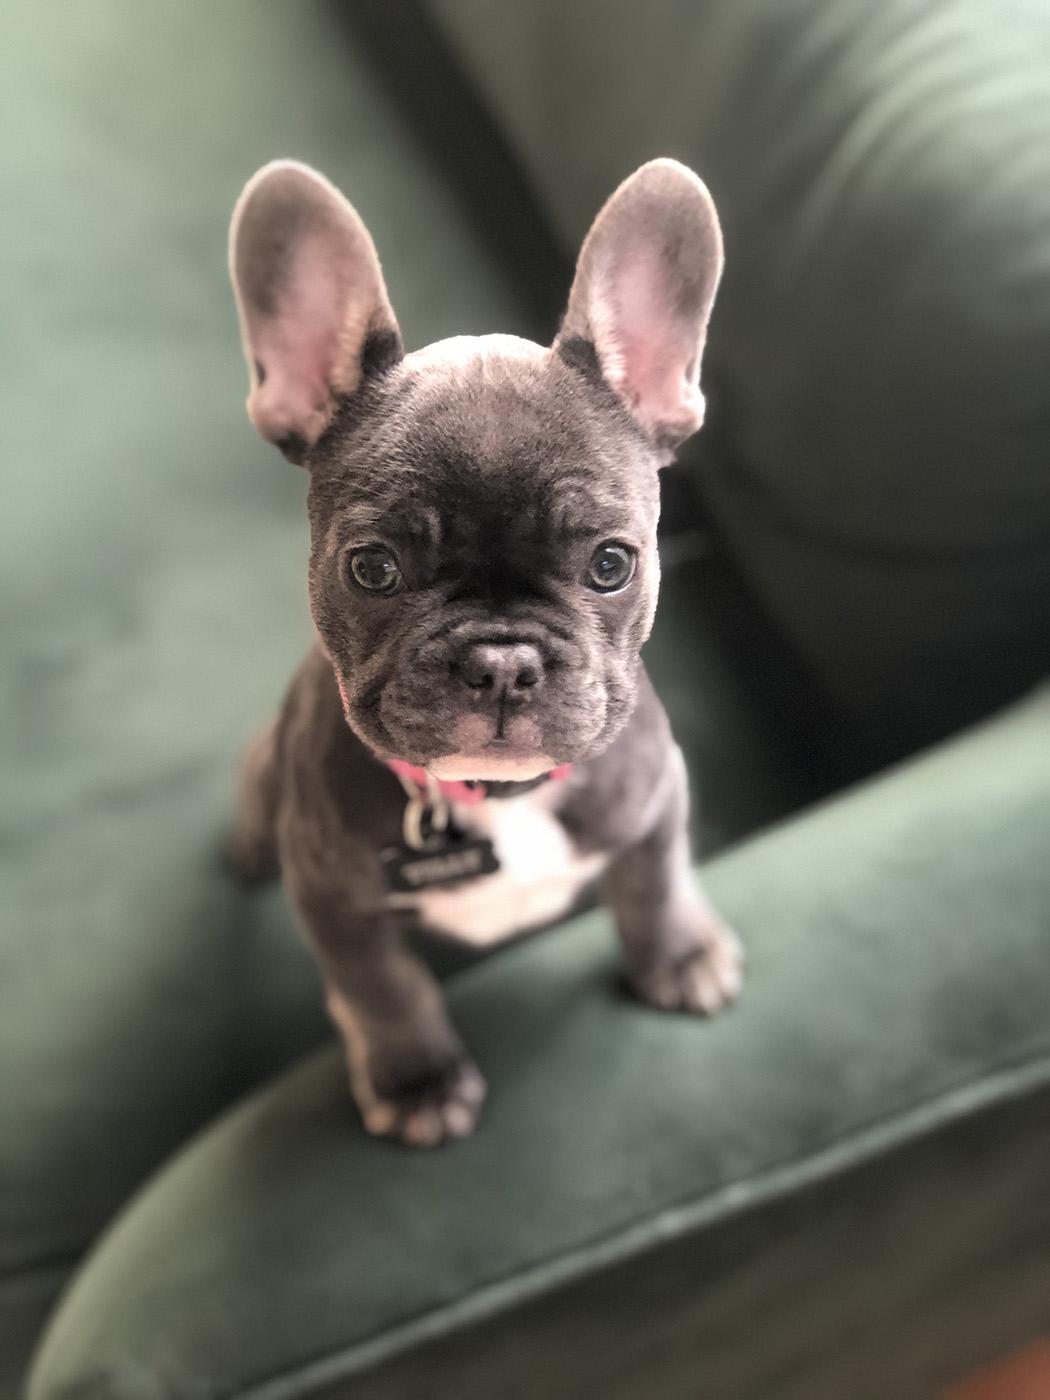 French Bulldog Puppies Dallas : french, bulldog, puppies, dallas, Tilly,, French, Bulldog, Puppy,, Cutest, Around, Lakewood/East, Dallas